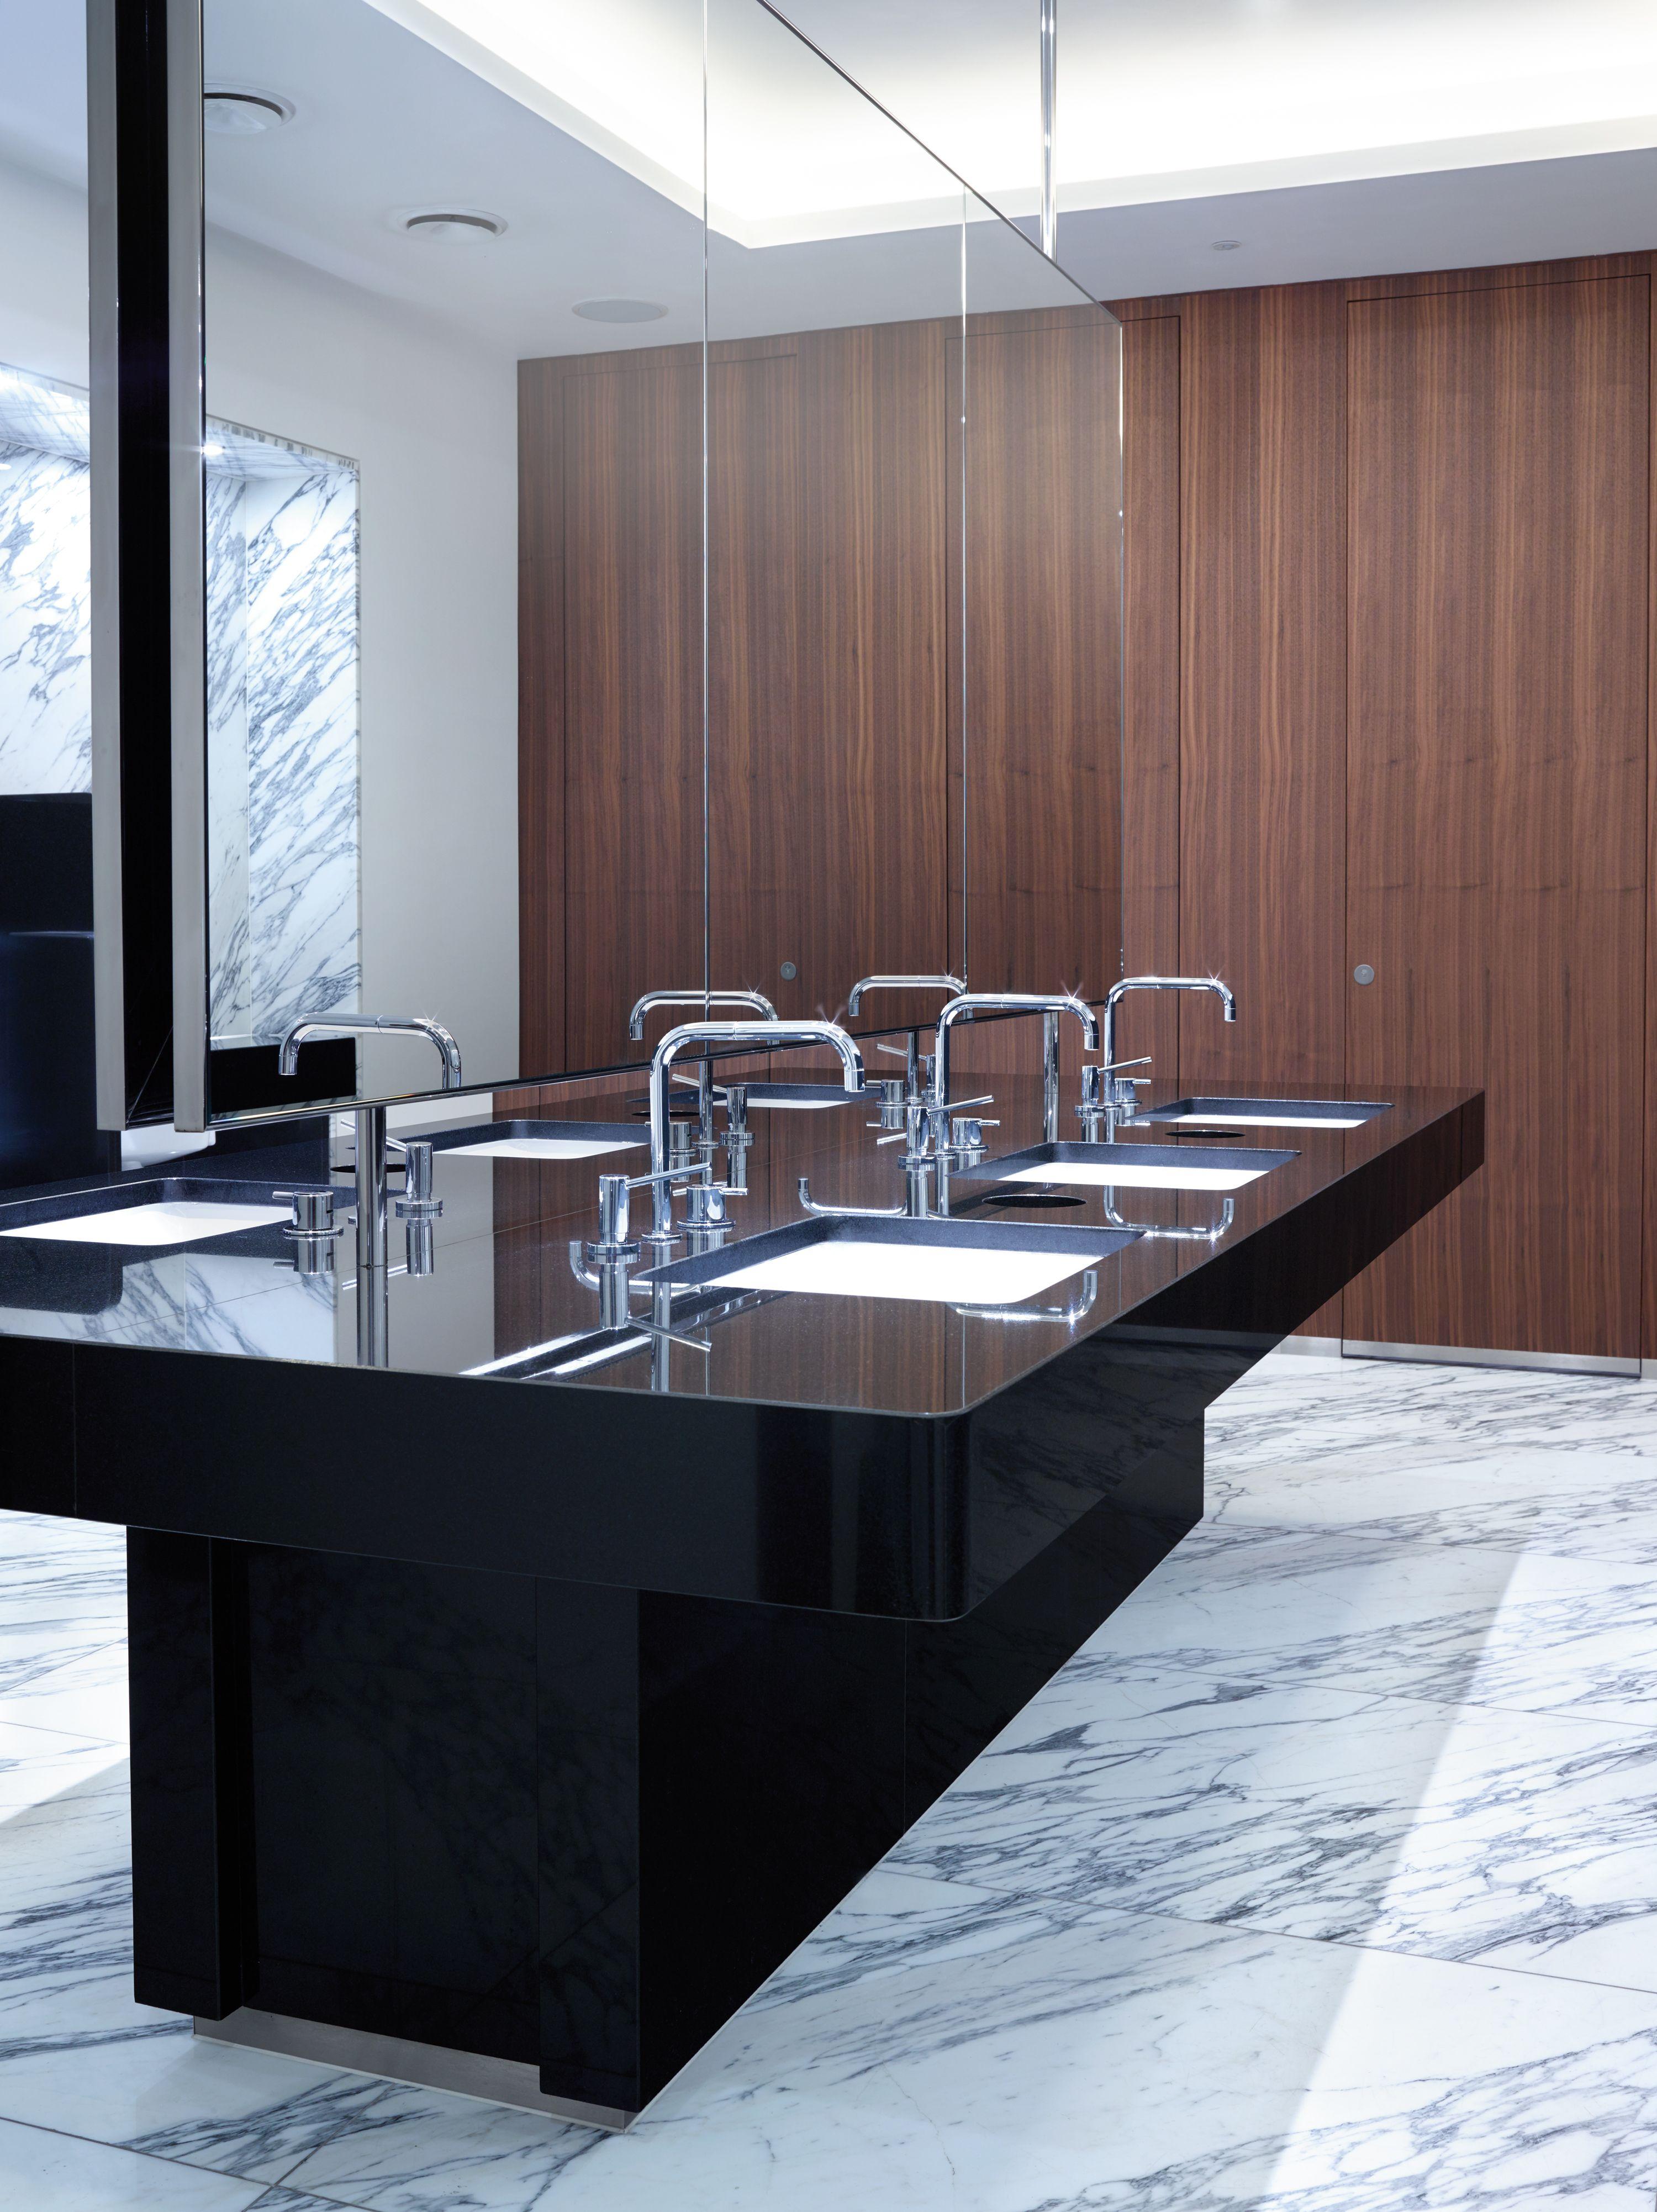 Luxury Commercial Bathroom Design VOLA 590 in 2020 ...